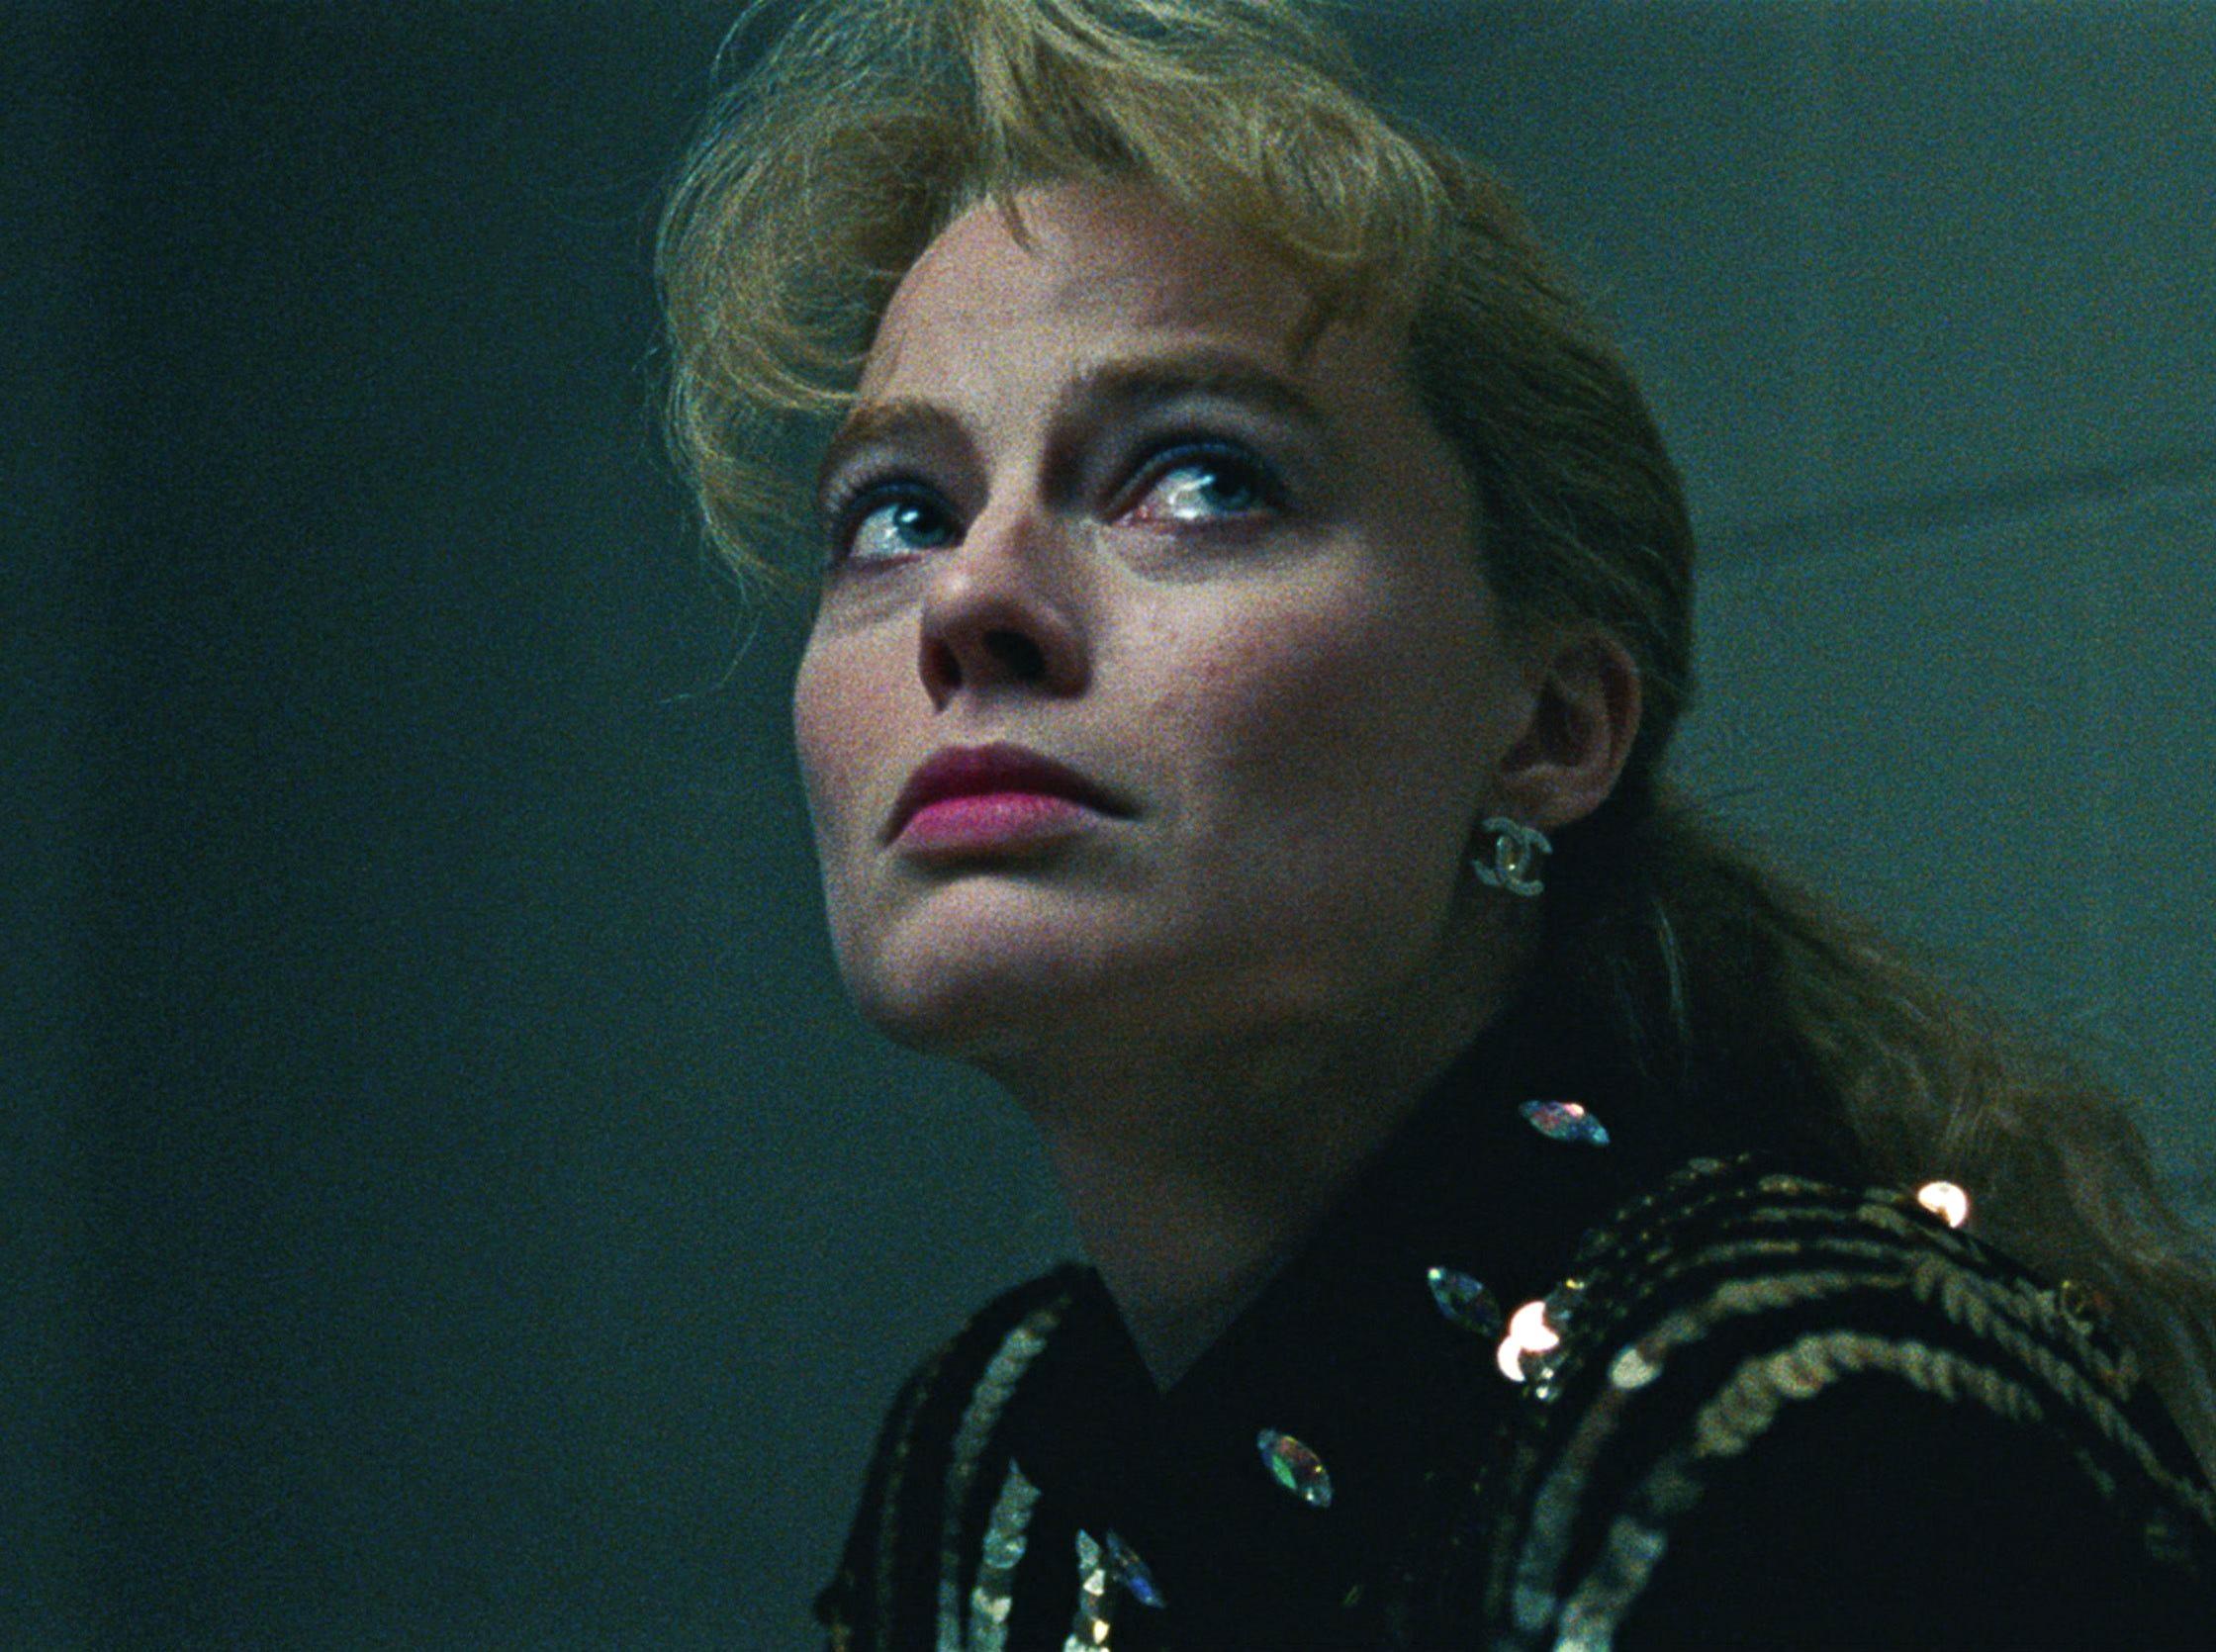 Margot Robbie plays polarizing figure skater Tonya Harding in the darkly comic biopic 'I, Tonya.'